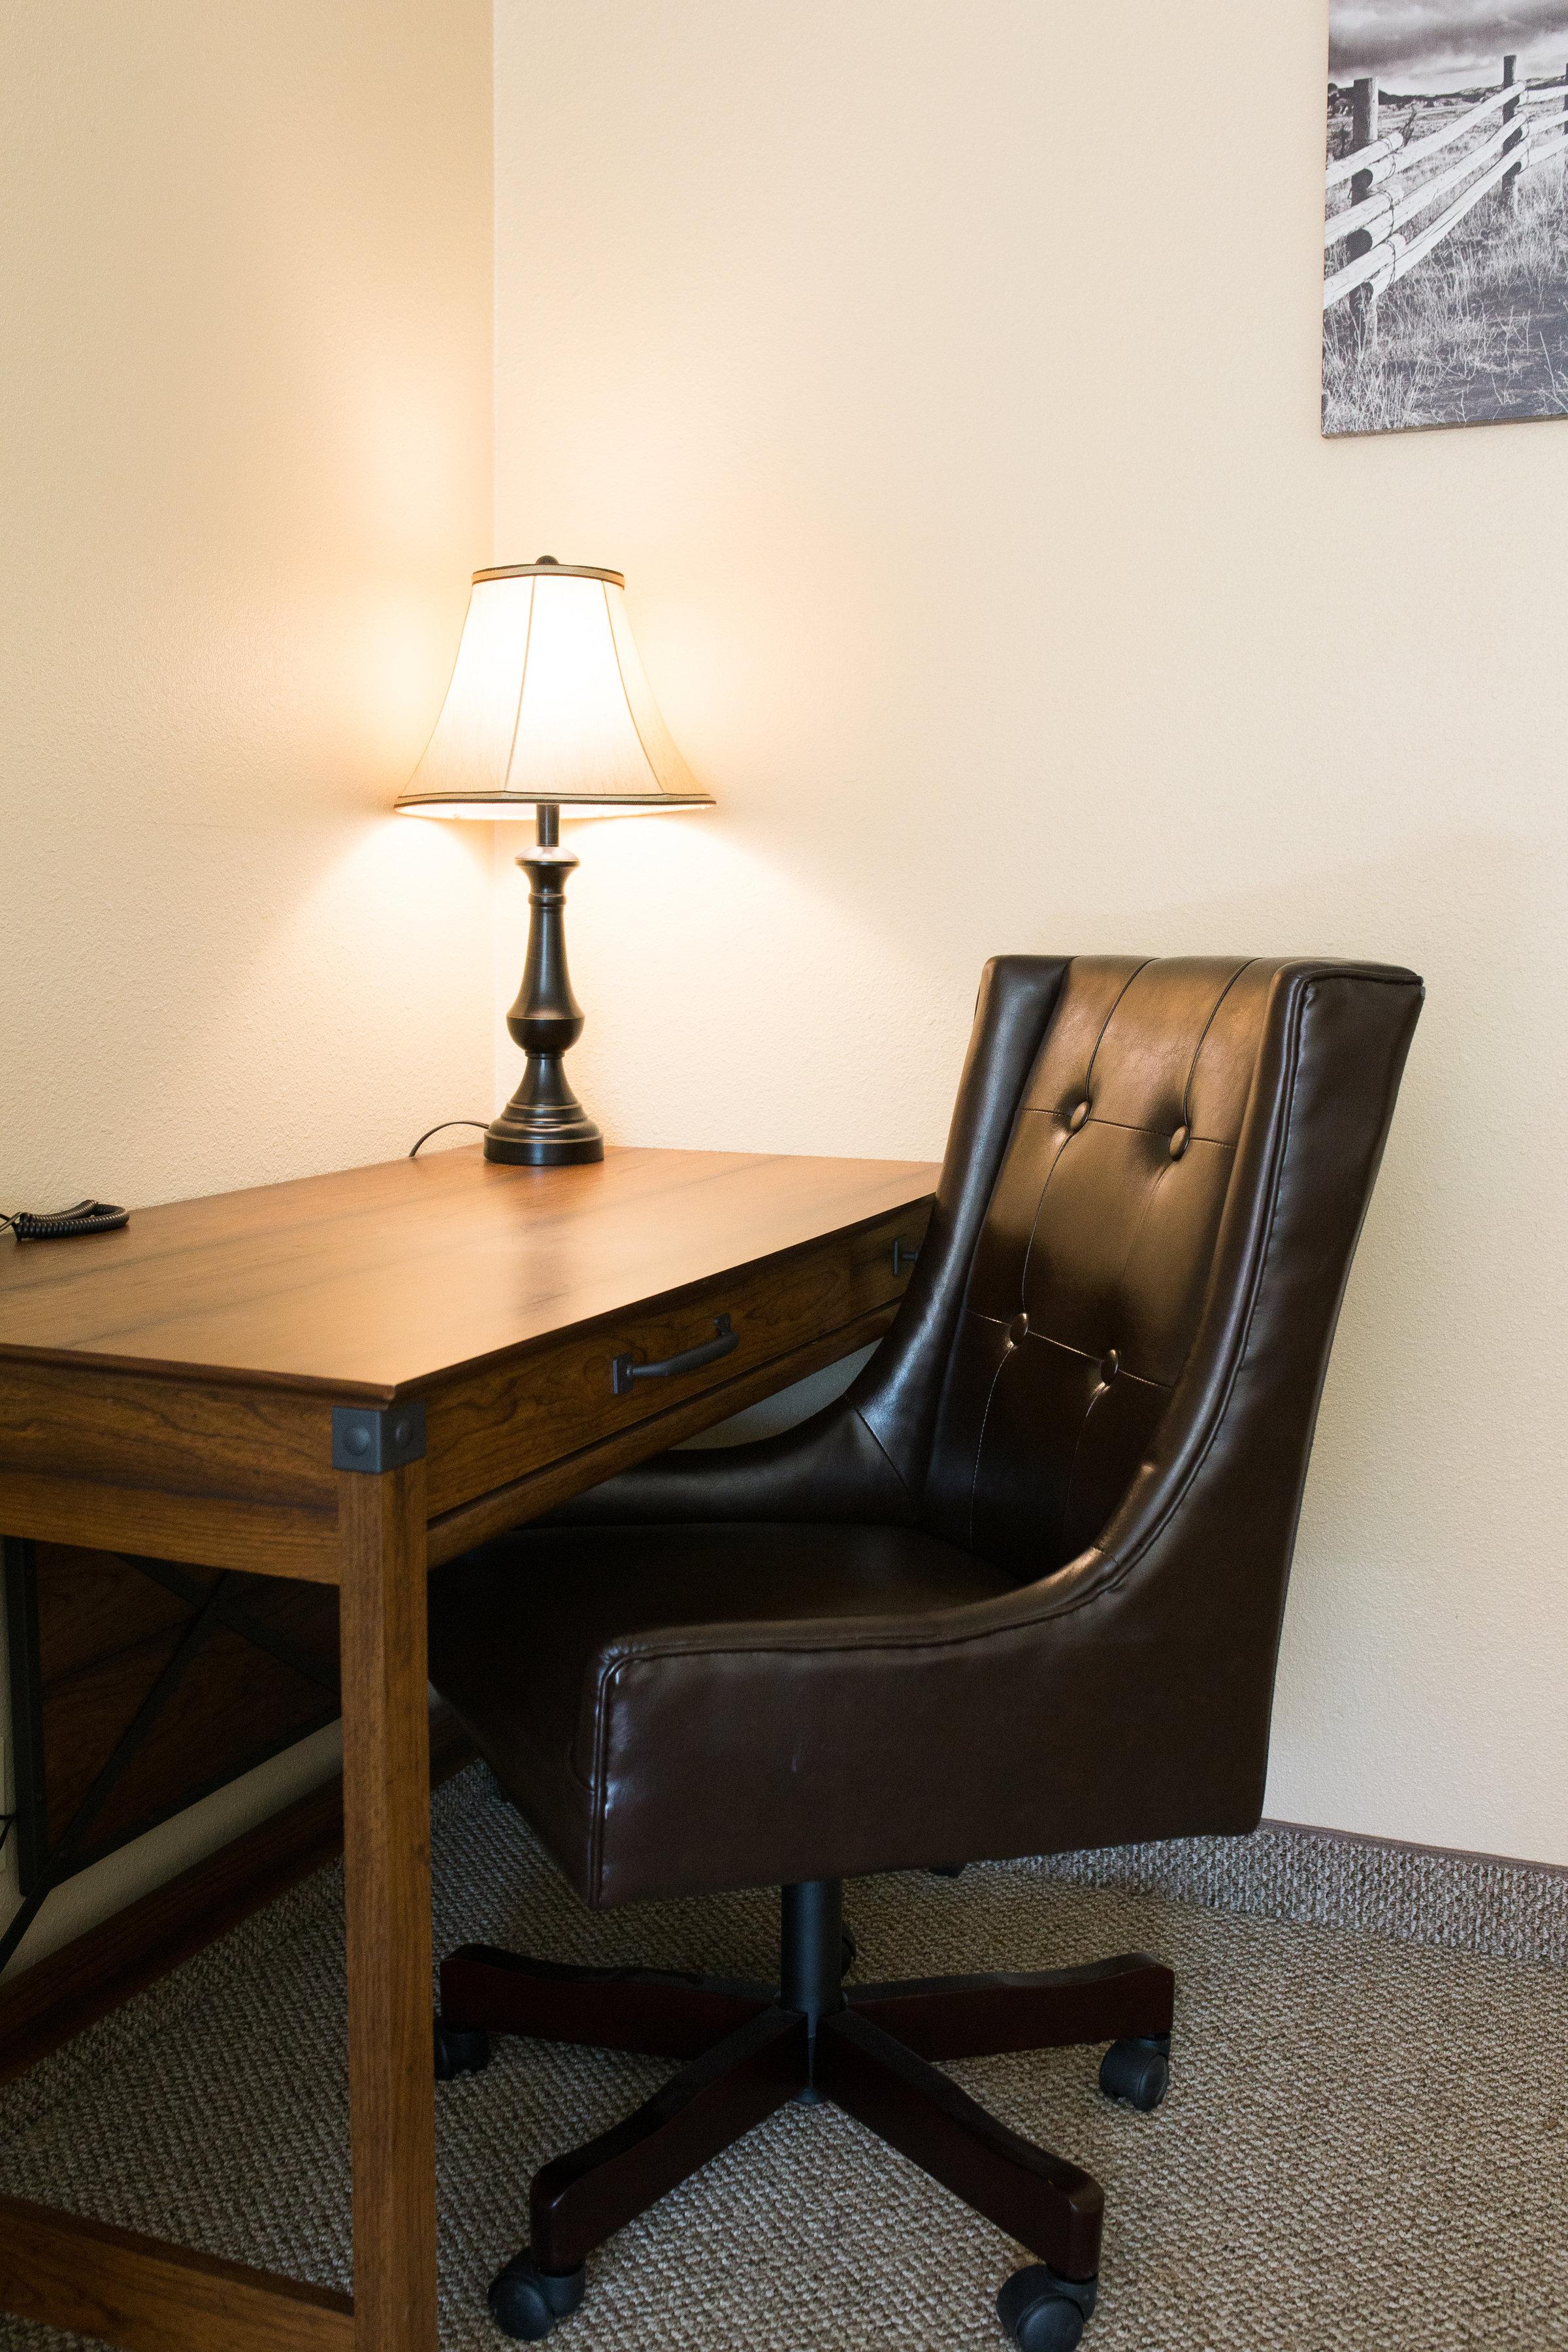 Motel Standard Desks